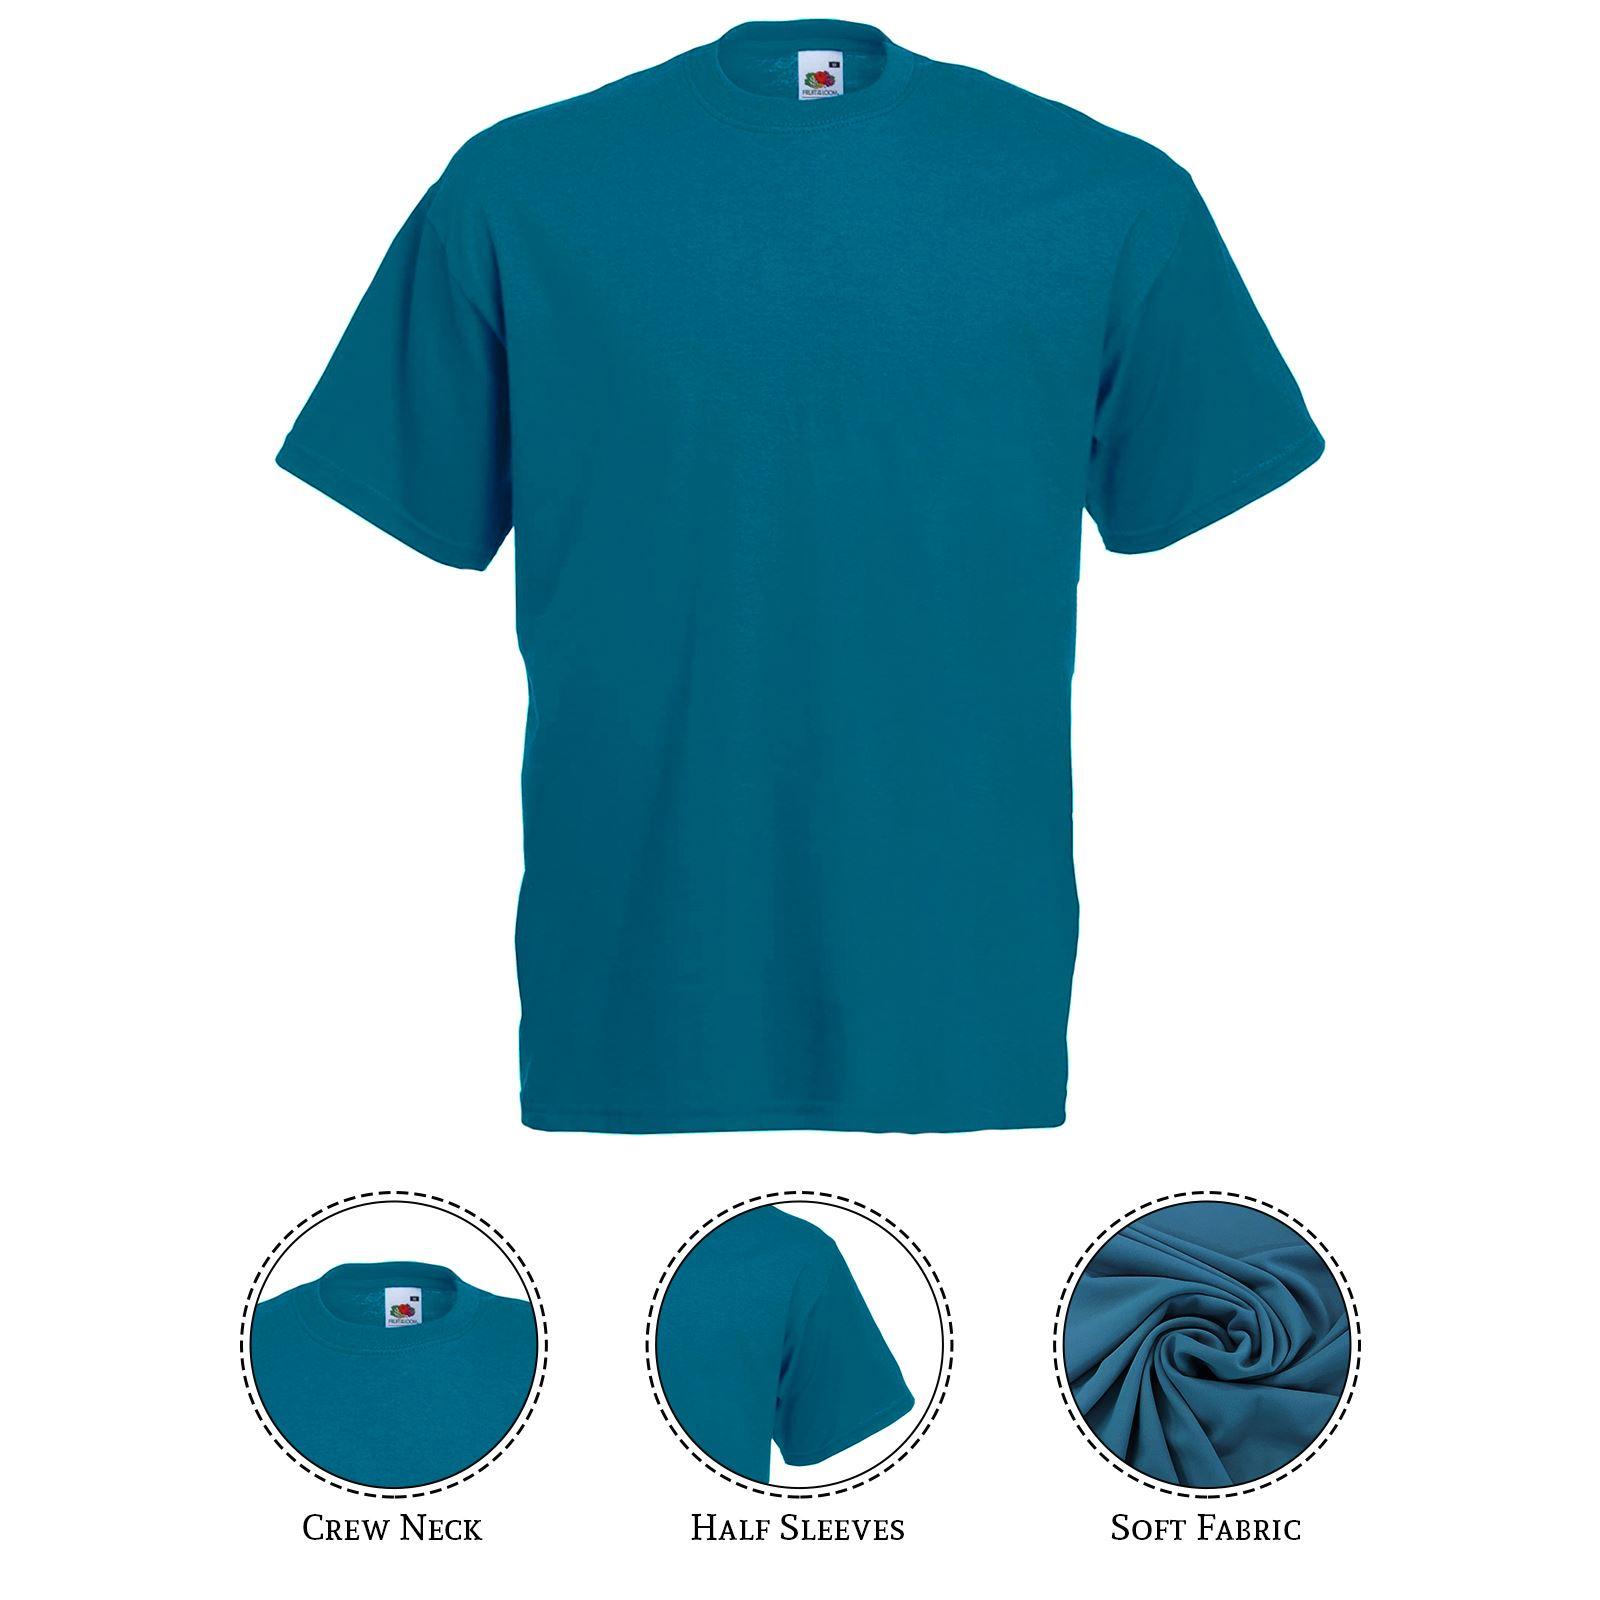 thumbnail 31 - Men-s-Fruit-Of-The-Loom-T-Shirt-Original-100-Cotton-Casual-Plain-Top-Tee